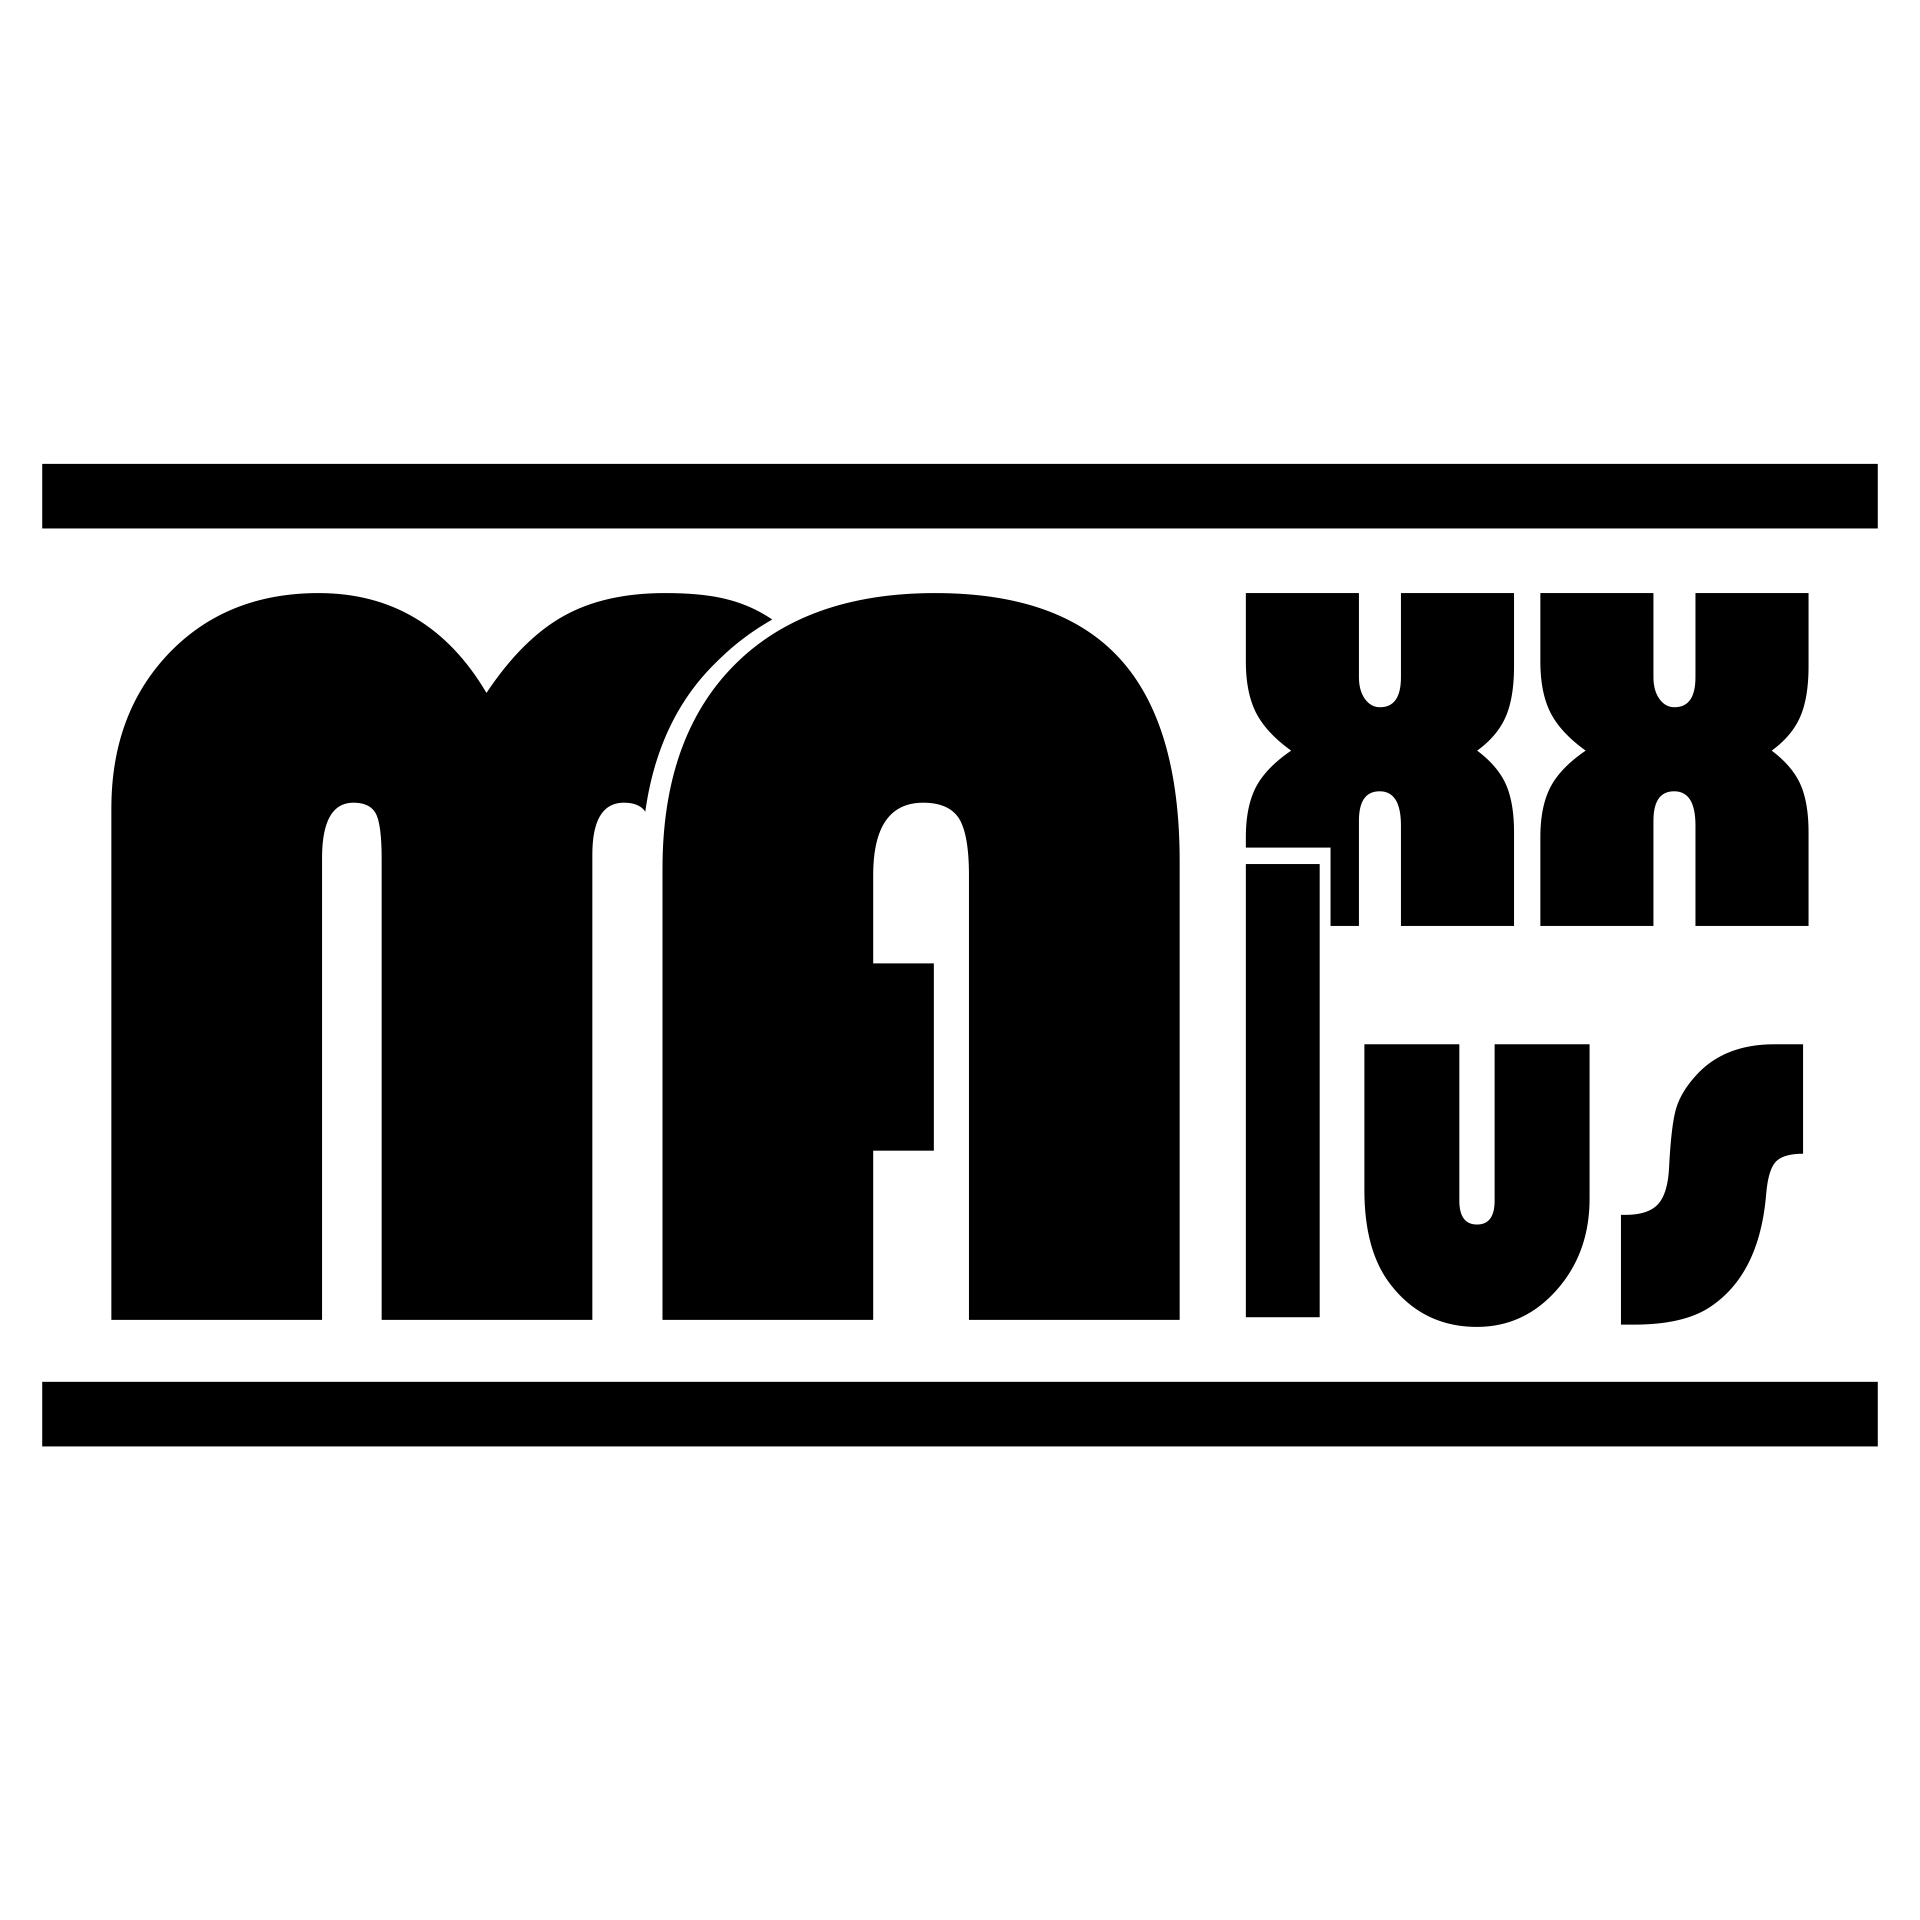 Логотип для нового бренда повседневной посуды фото f_7855b9d0691ae140.jpg